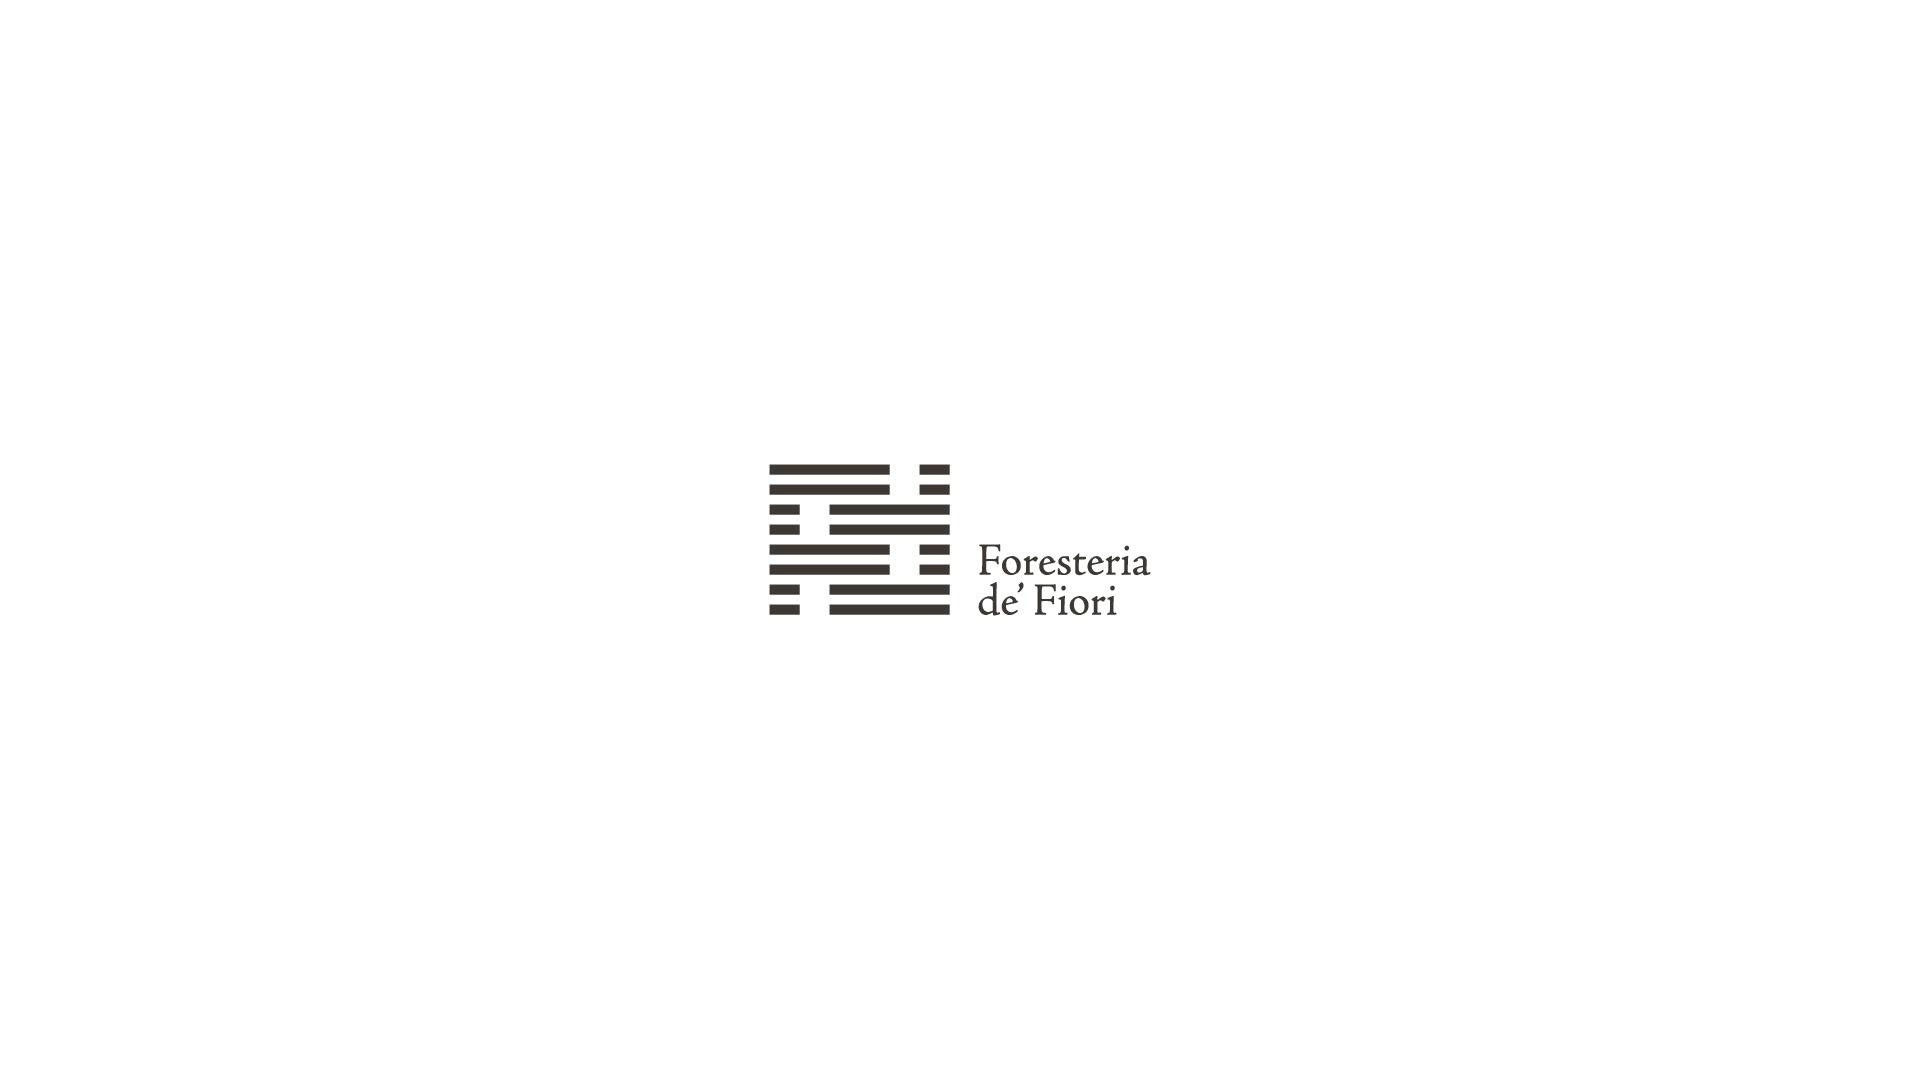 Sundog Studio - Foresteria de' Fiori - Logo